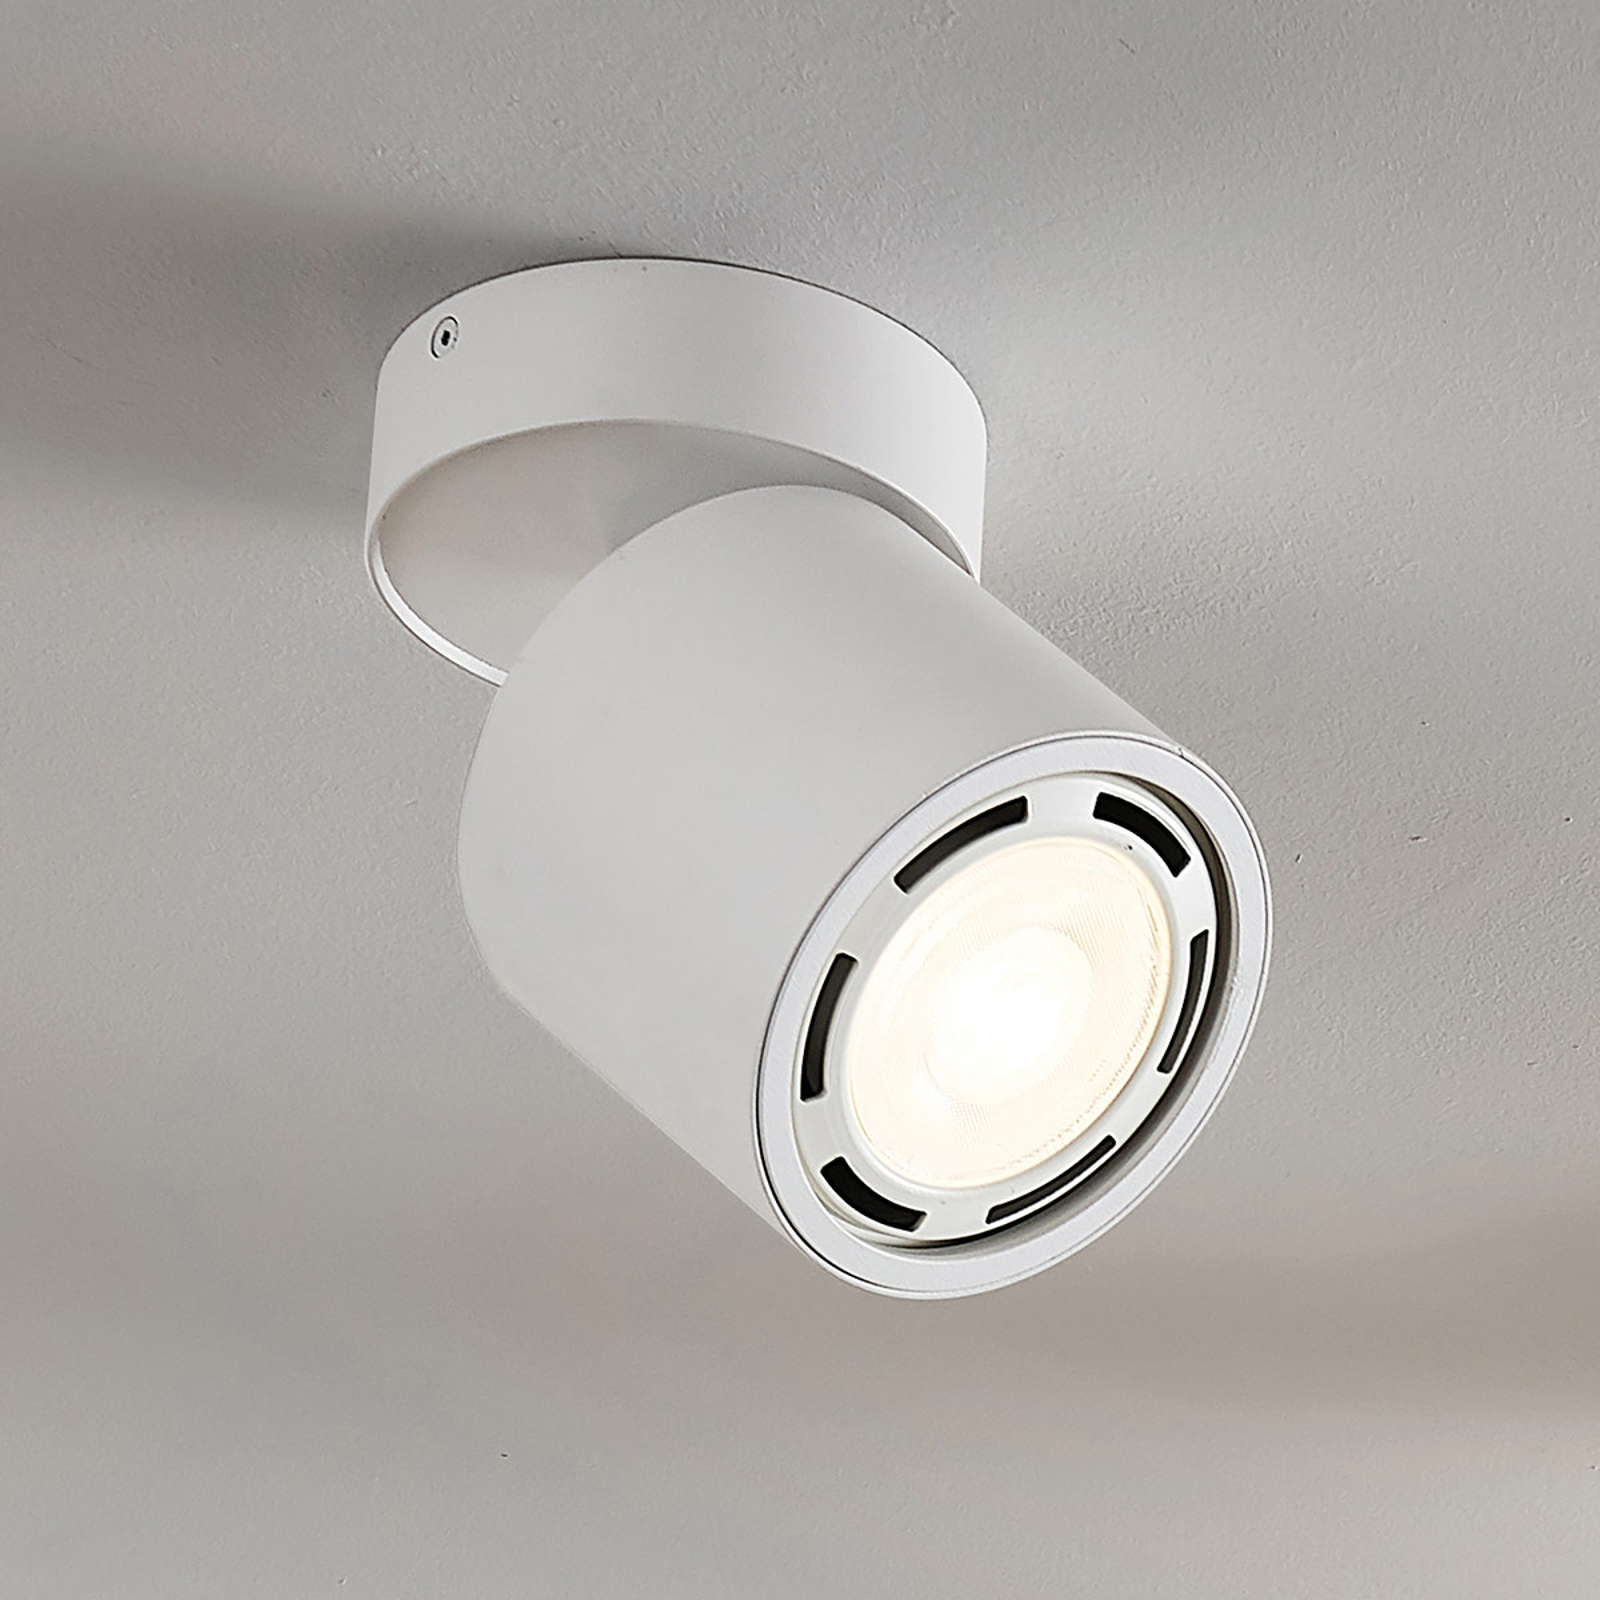 LED-spotti Avantika valkoinen, himm.